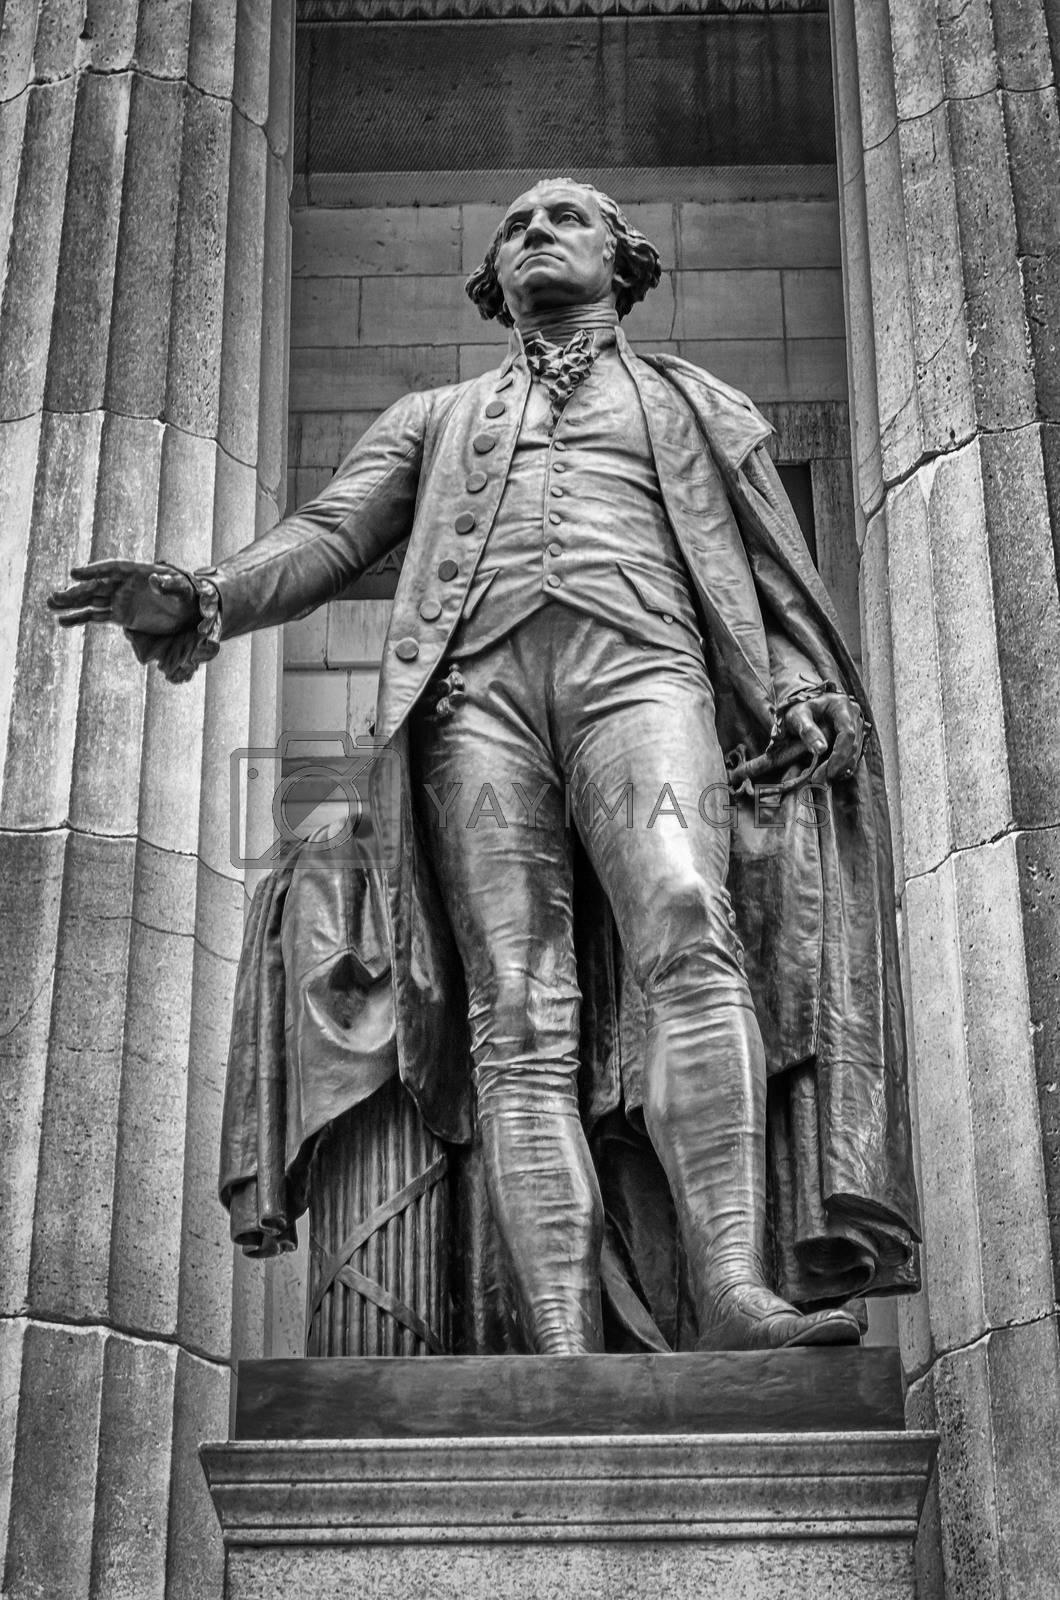 George Washington Statue, Federal Hall, New York City